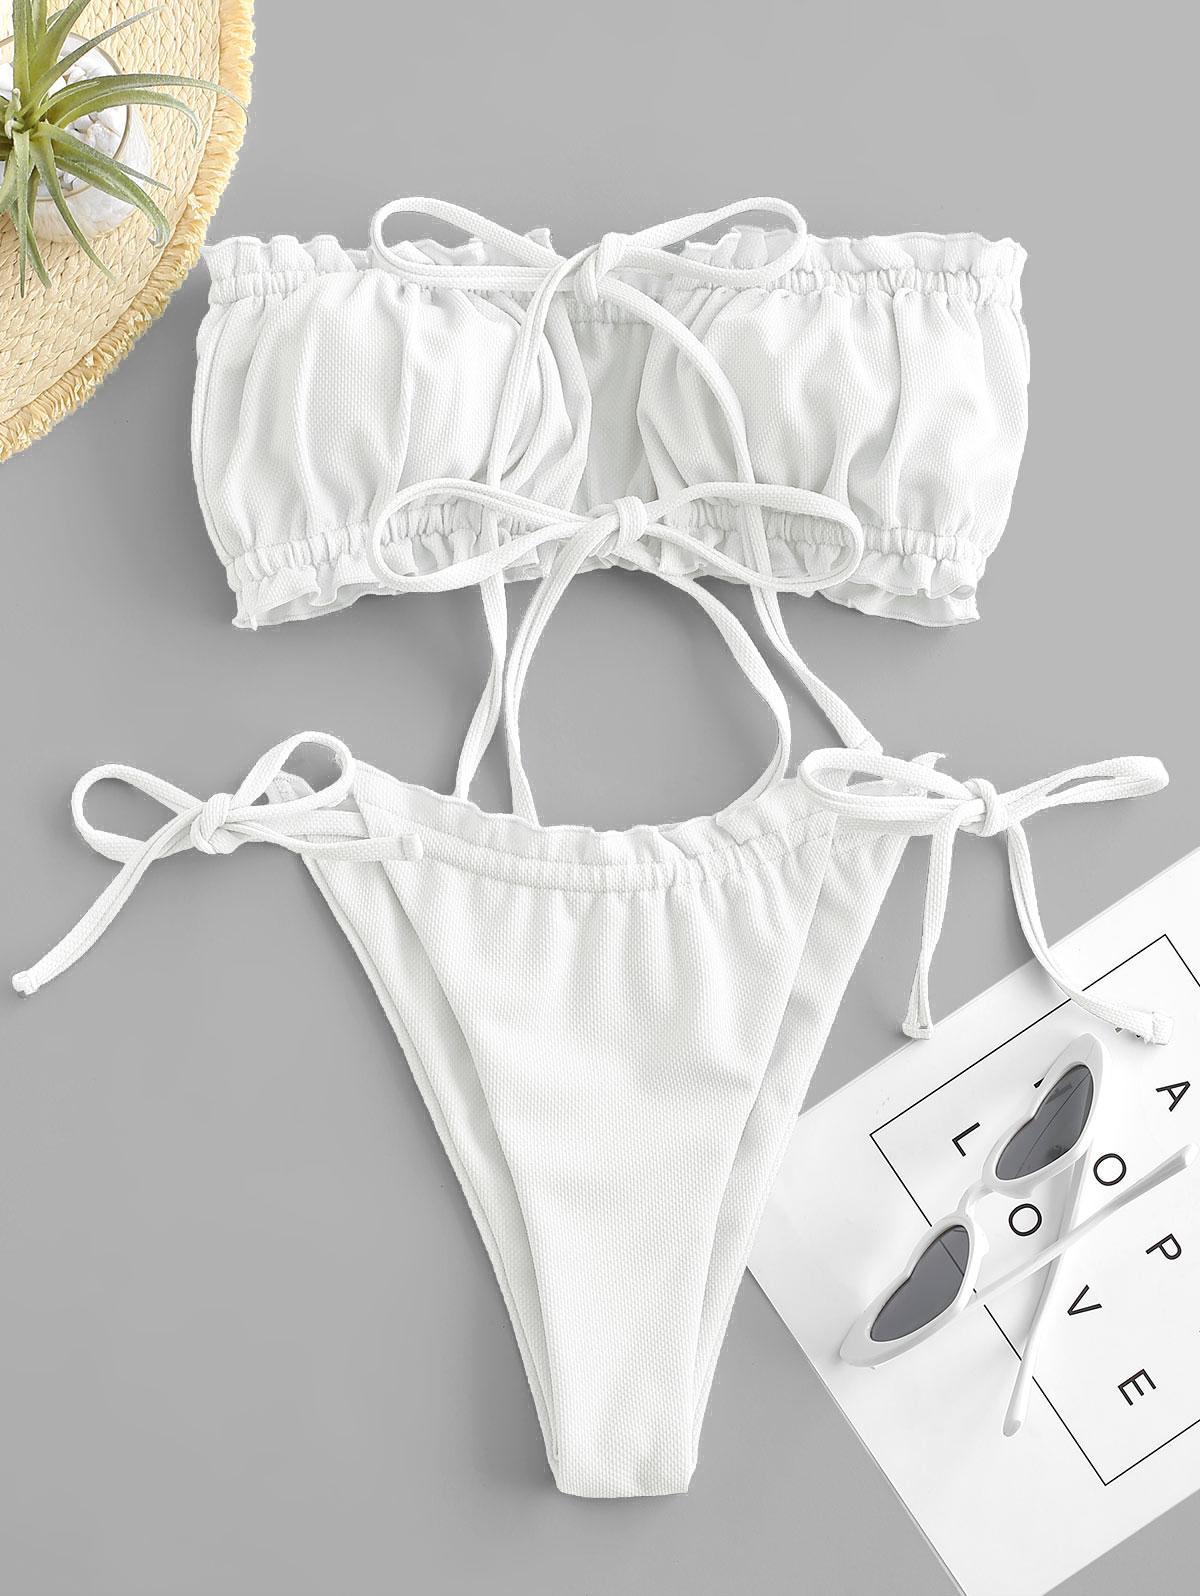 ZAFUL Maillot de Bain Bikini Bandeau Noué Texturé à Volants M - Zaful FR - Modalova